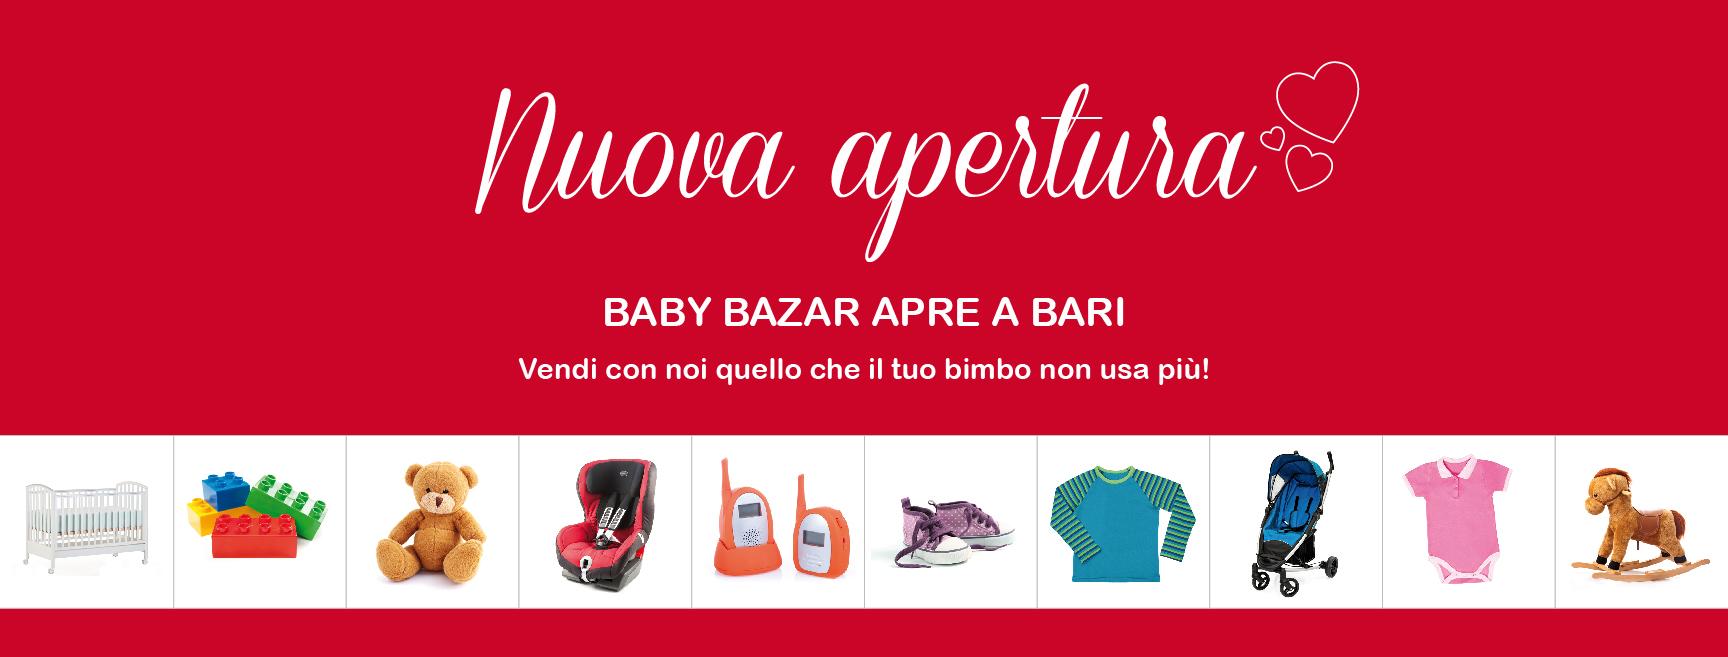 baby-bazar-bari-2019